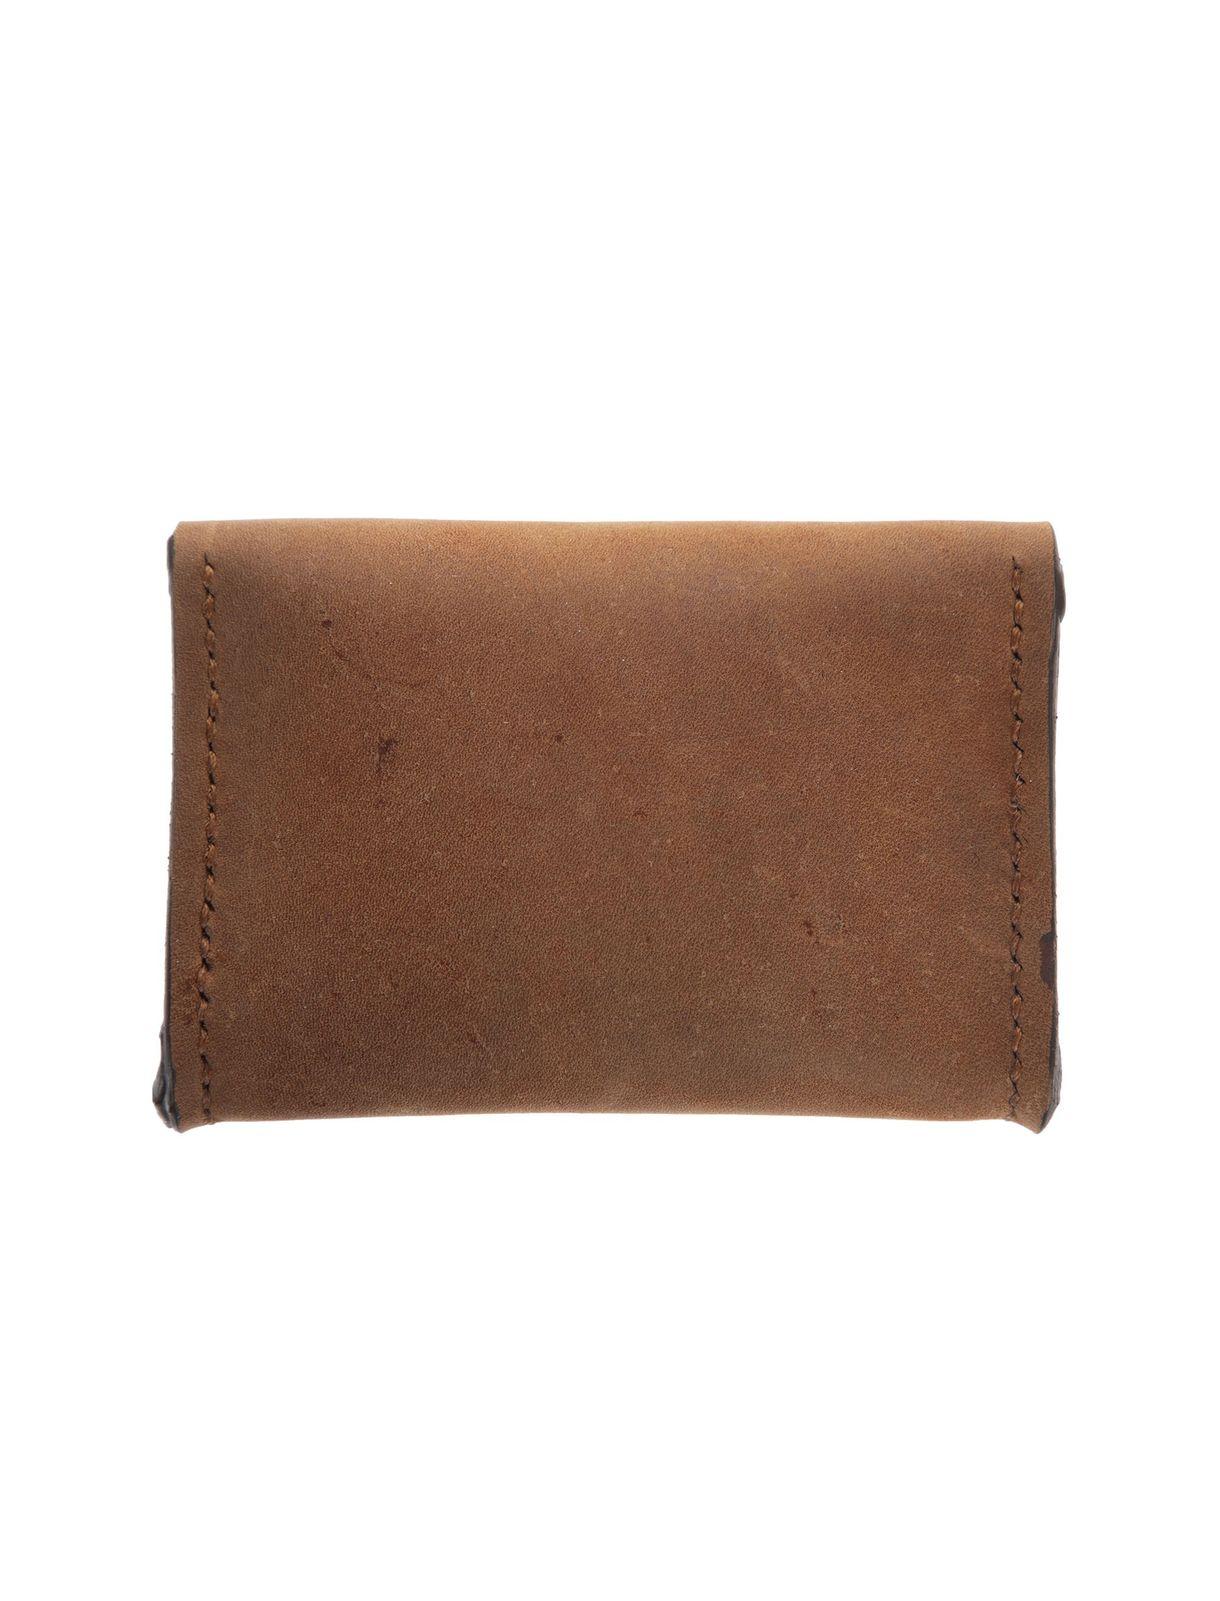 کیف کارت اعتباری چرم بزرگسال - چرم لانکا تک سایز main 1 2